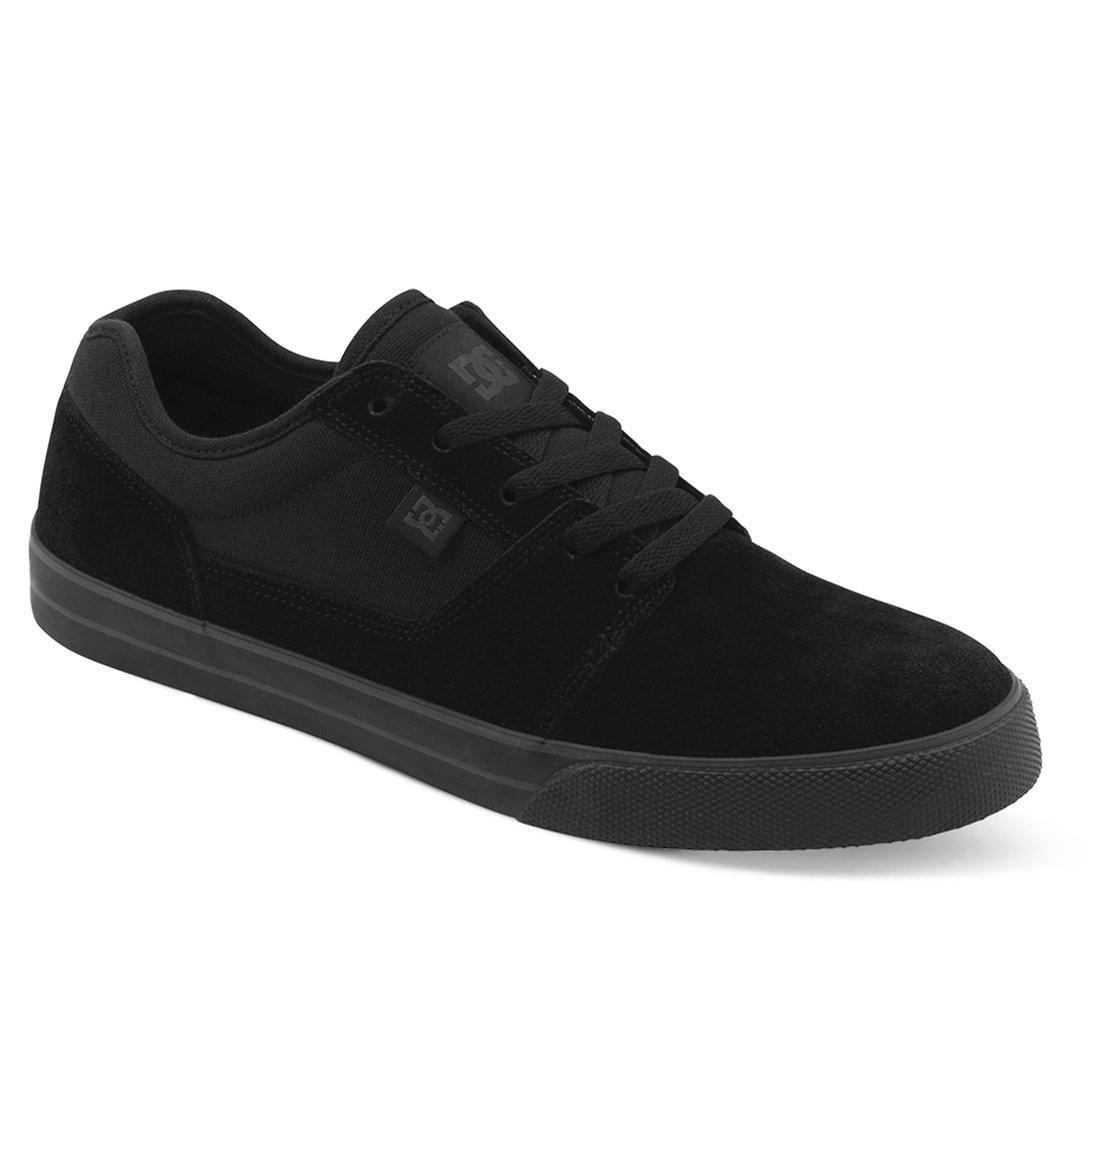 Sneakers DC Tonik black/black